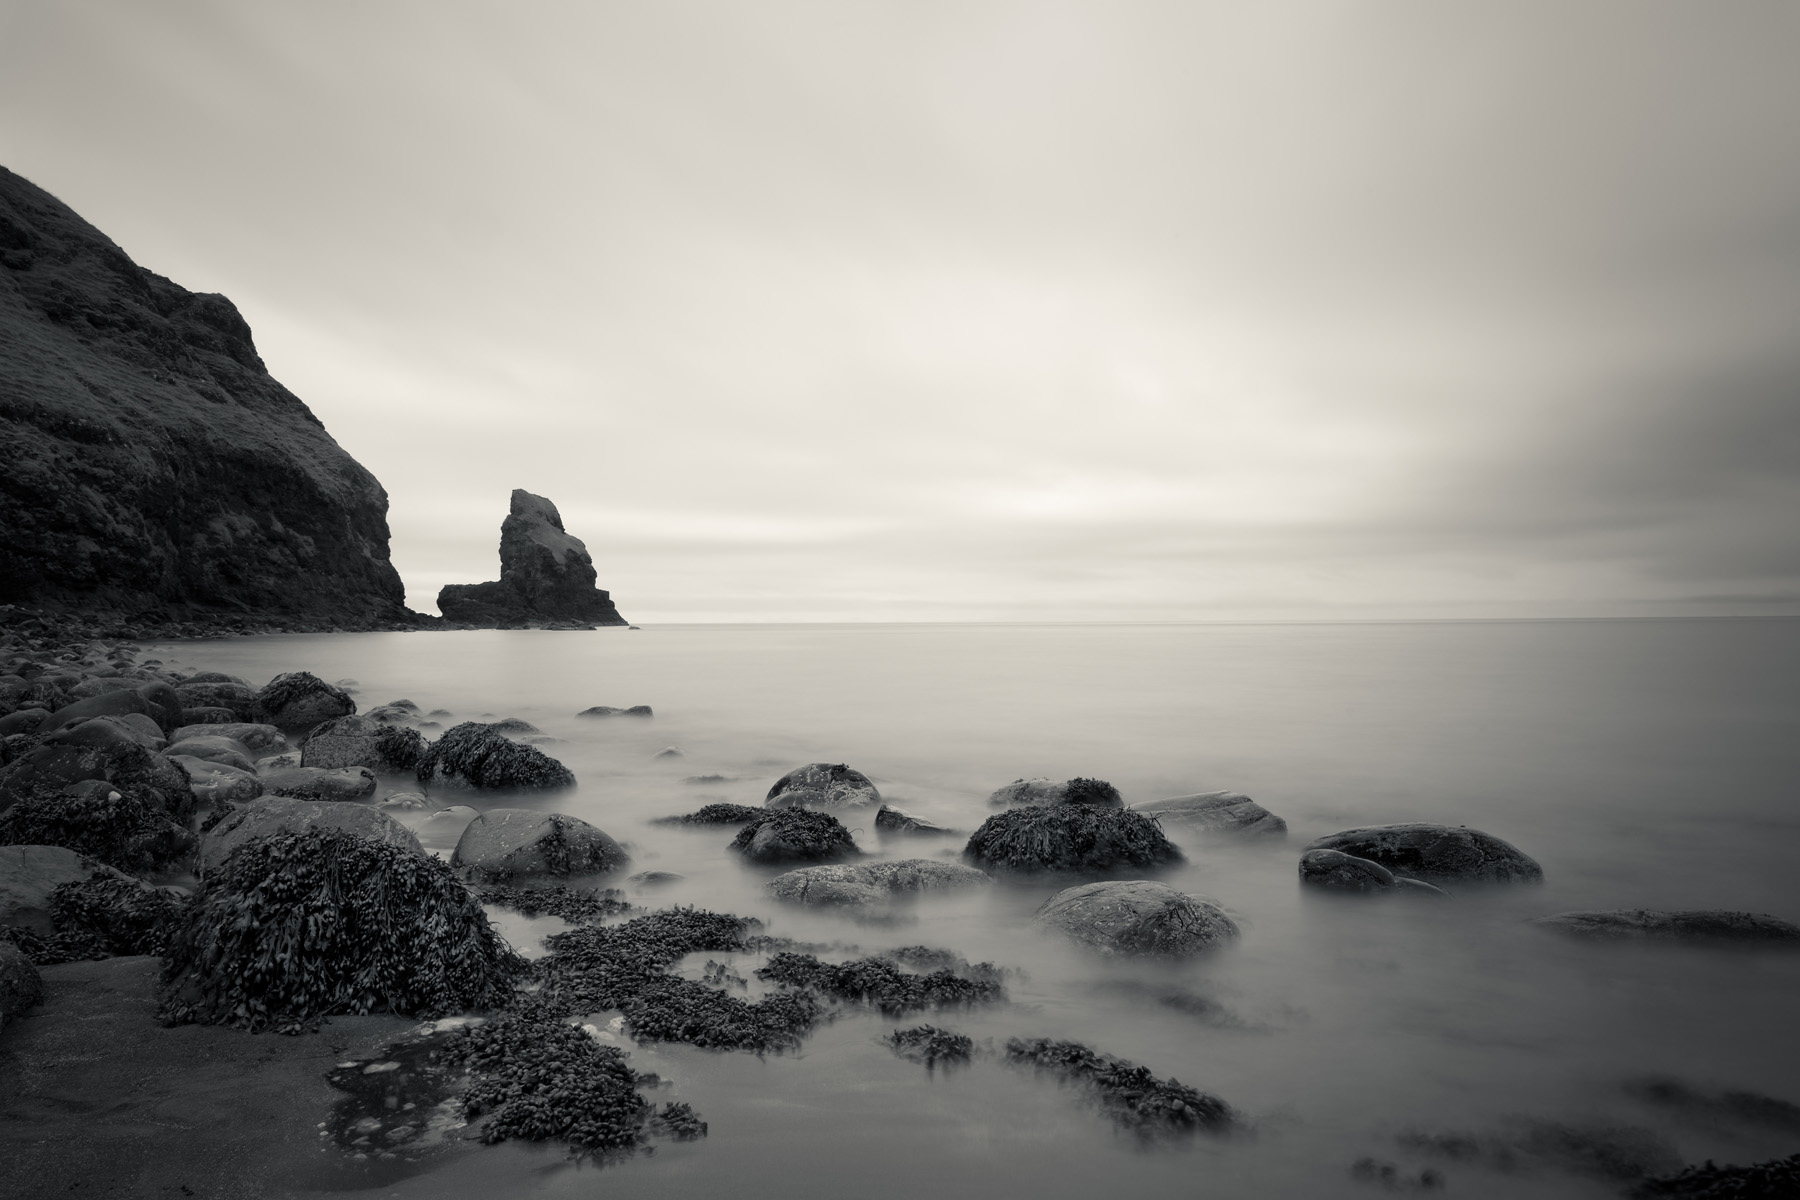 Gloomy Day, Talisker Bay